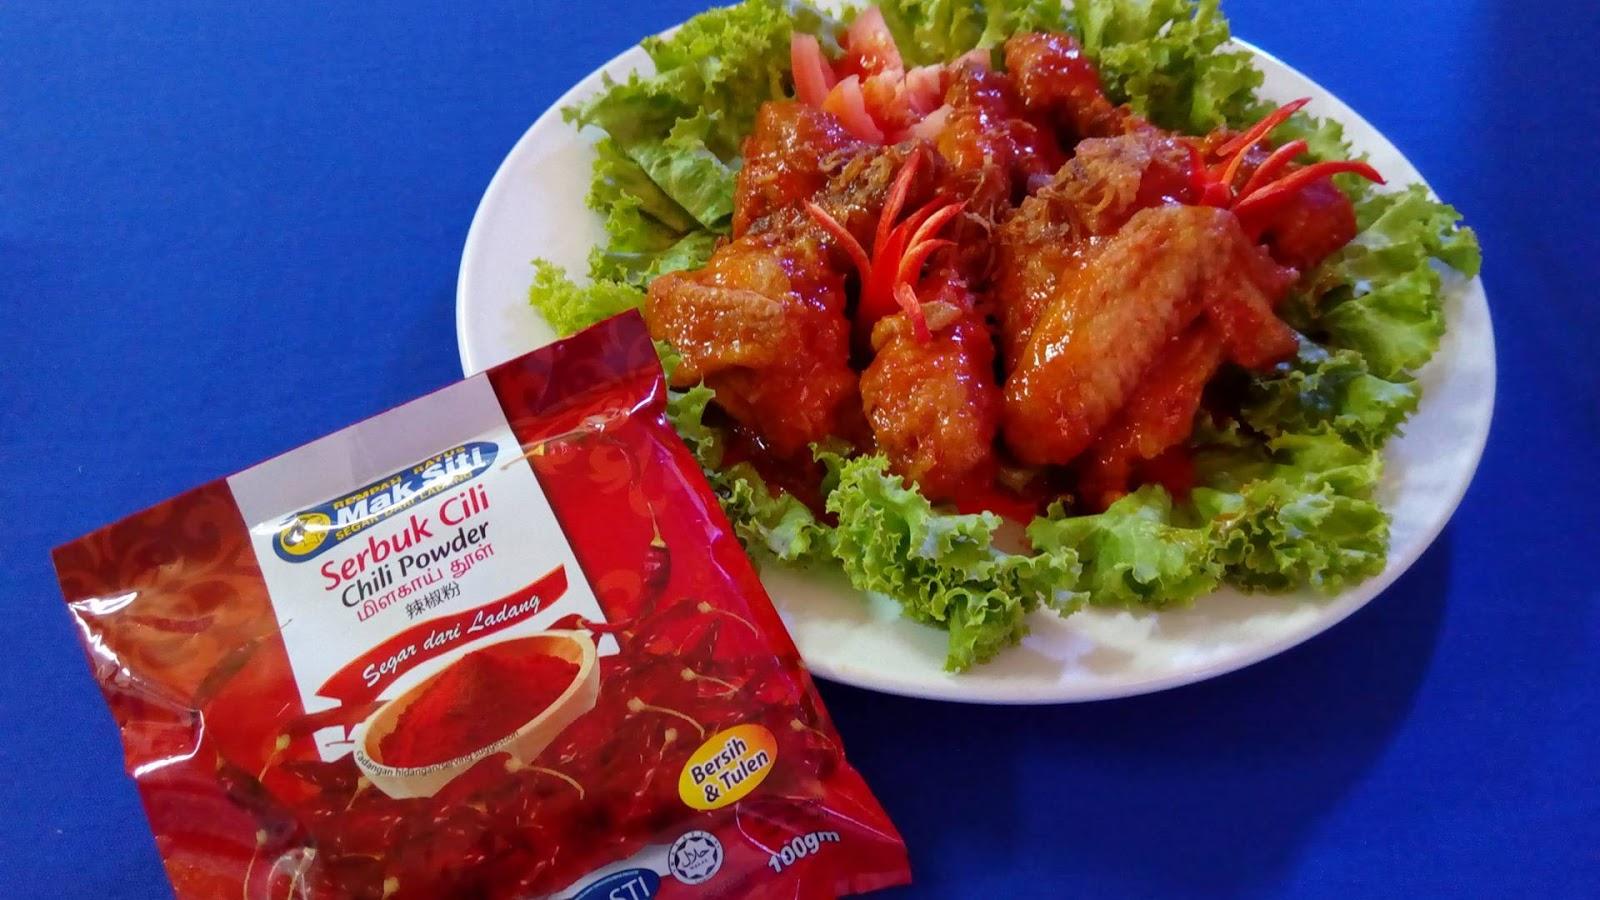 Resepi Mee Soto Yang Sedap dan Mudah Dengan Menggunakan Rempah Mak Siti